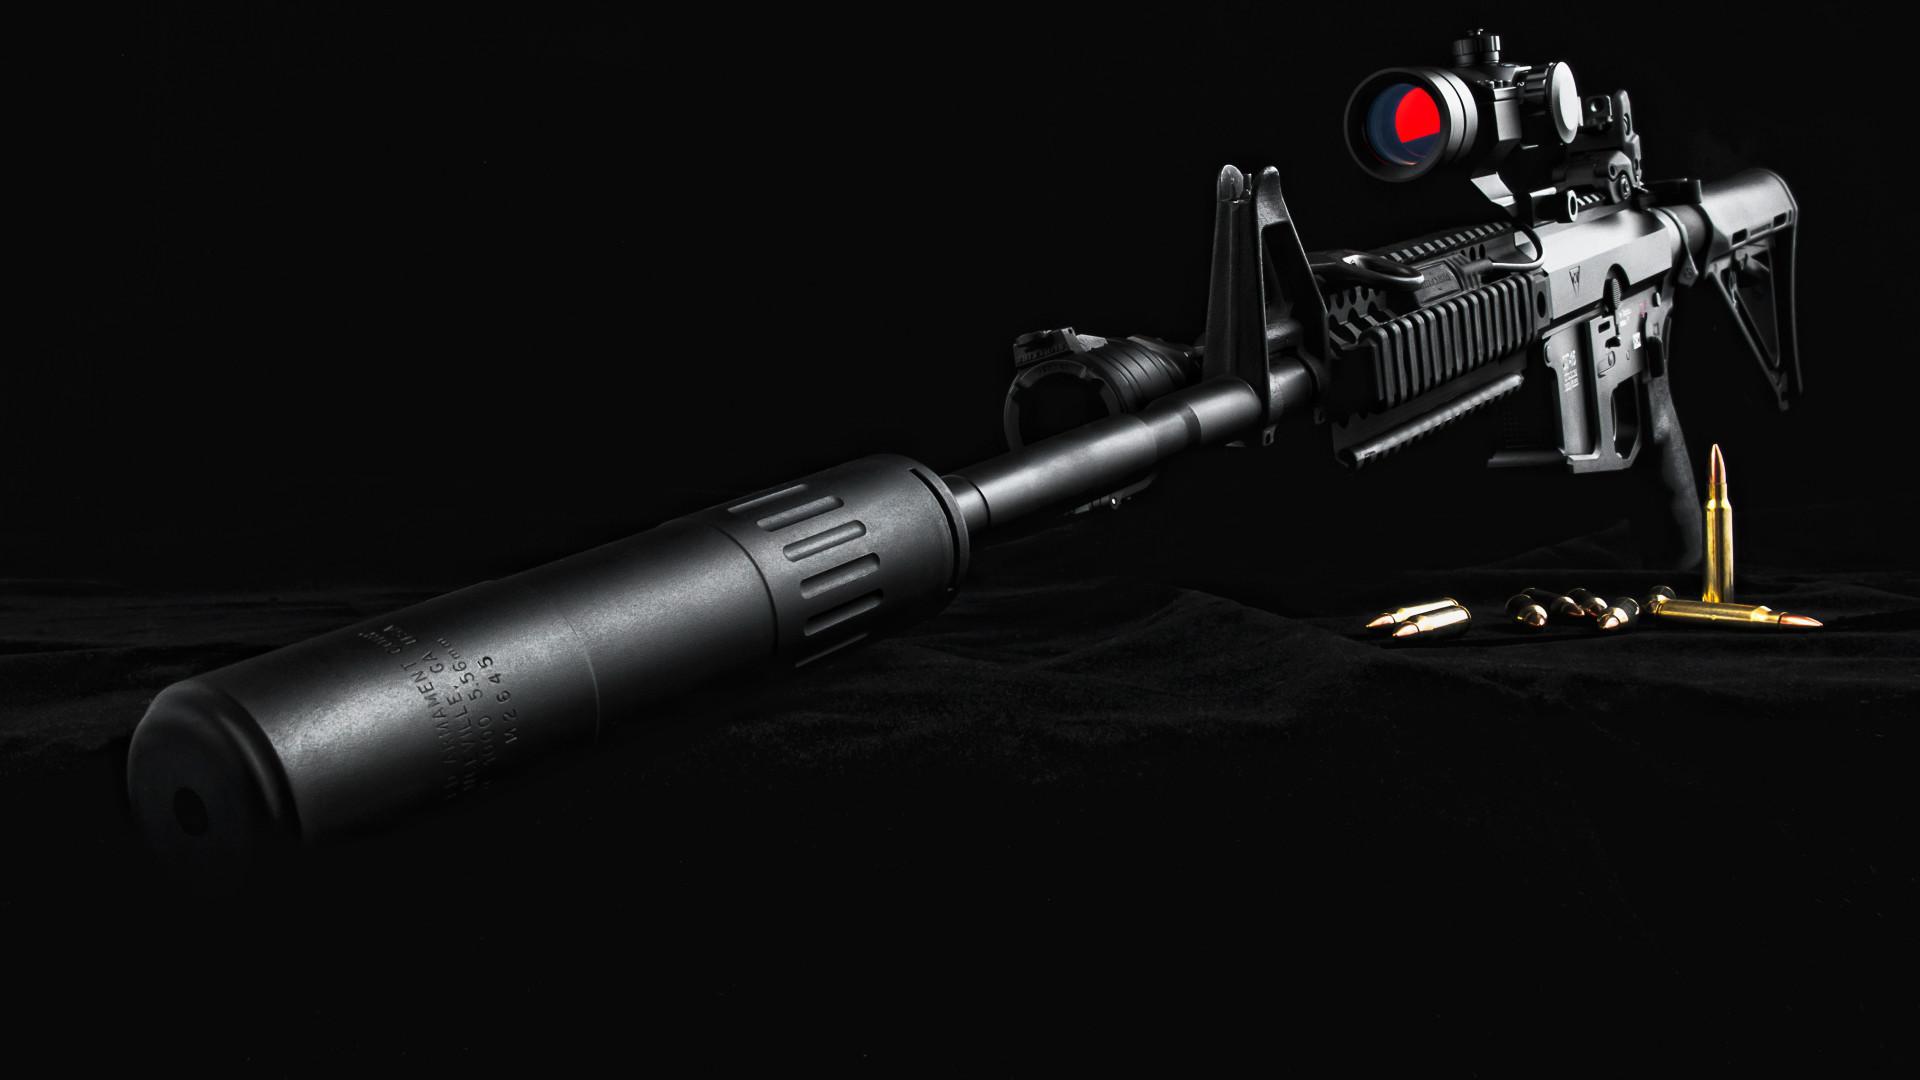 Res: 1920x1080, Glock 18 Automatic Pistol Wallpaper